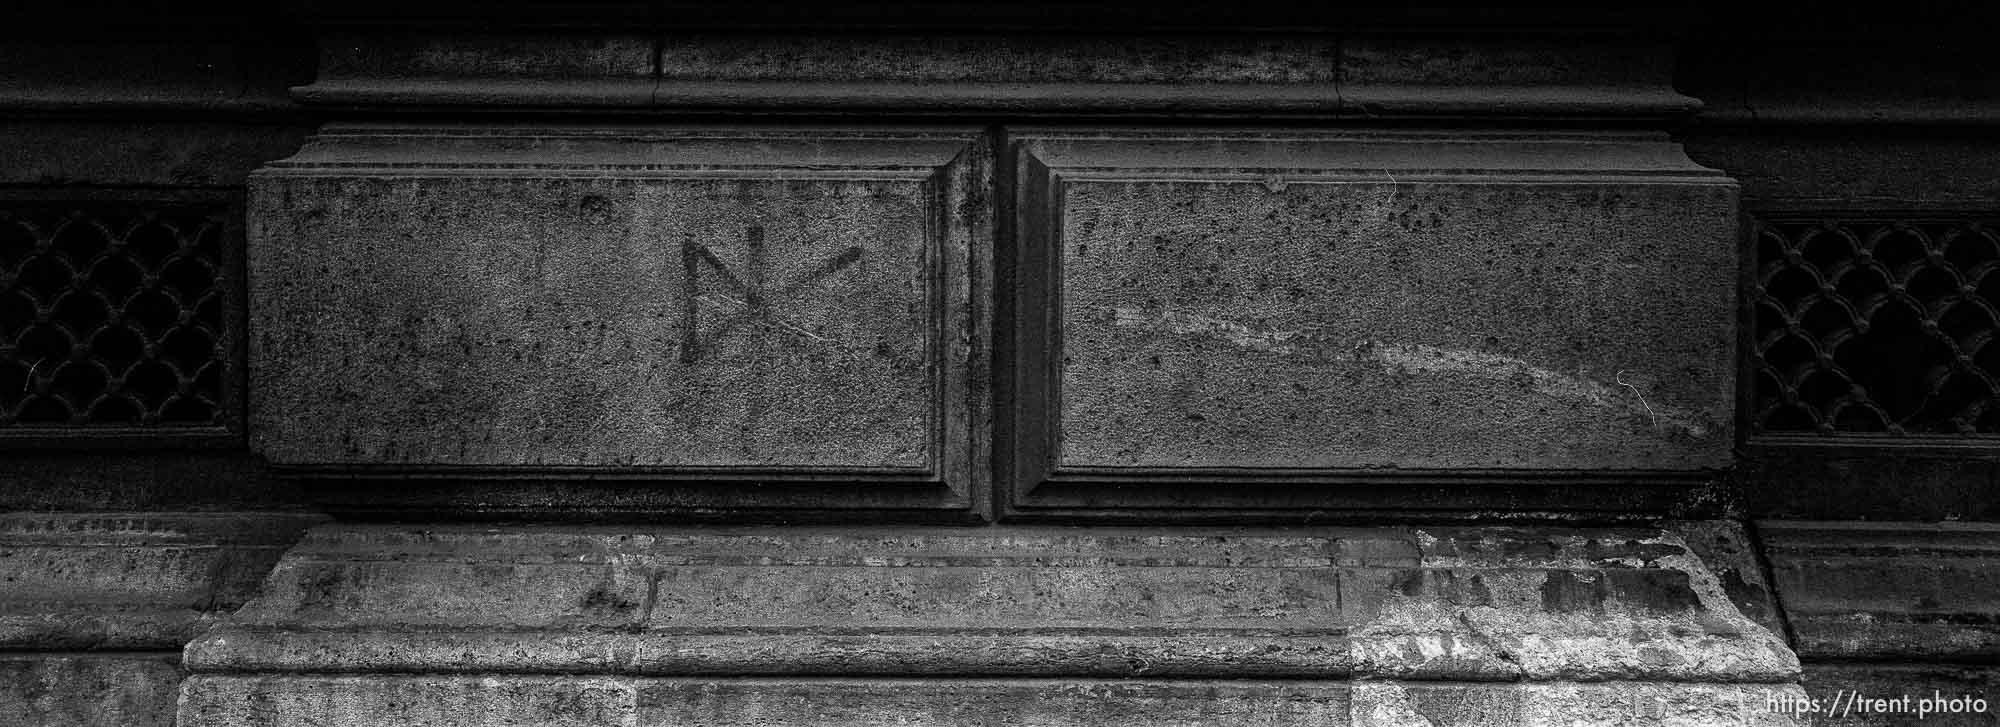 Dead Kennedys graffiti on building.